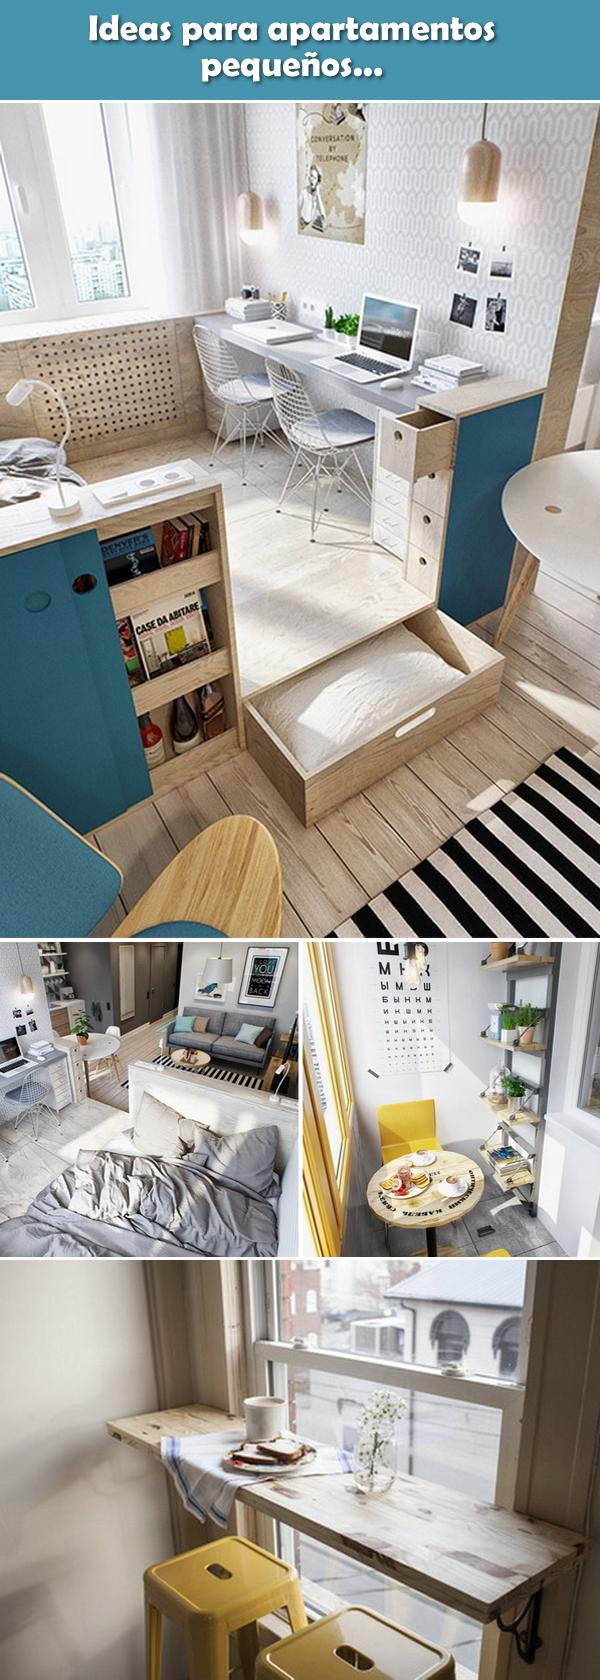 Apartamentos Pequenos Ideas Para Aprovechar Los Espacios Decoracion De Departamentos Pequenos Apartamentos Decoracion Apartamentos Pequenos